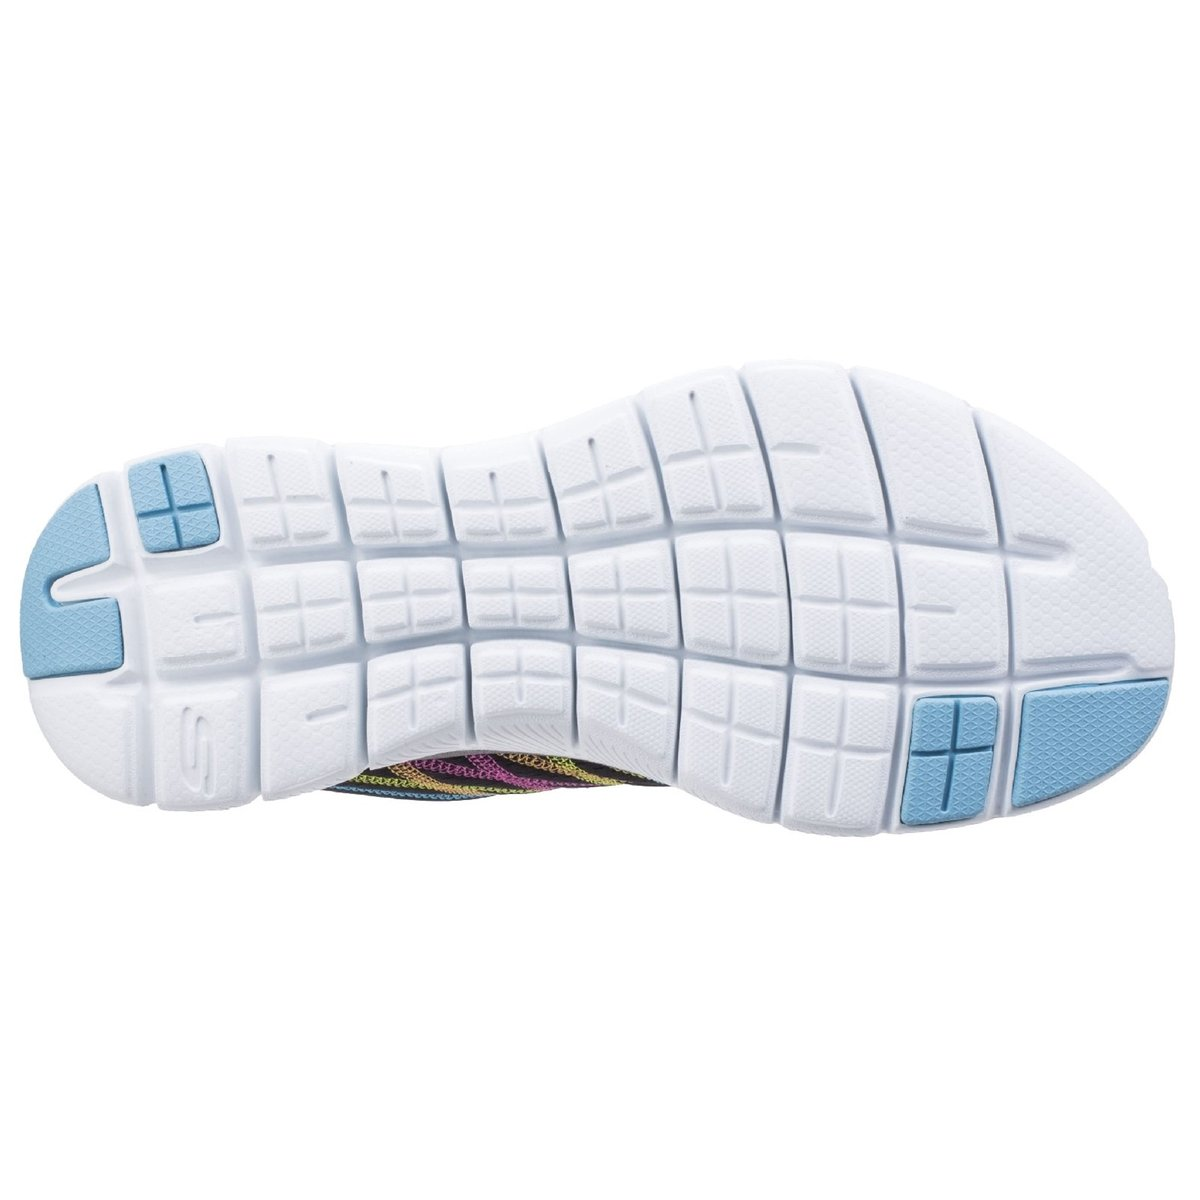 Skechers-Zapatillas-modelo-Flex-Appeal-2-0-Act-Cool-para-mujer-FS5197 miniatura 10